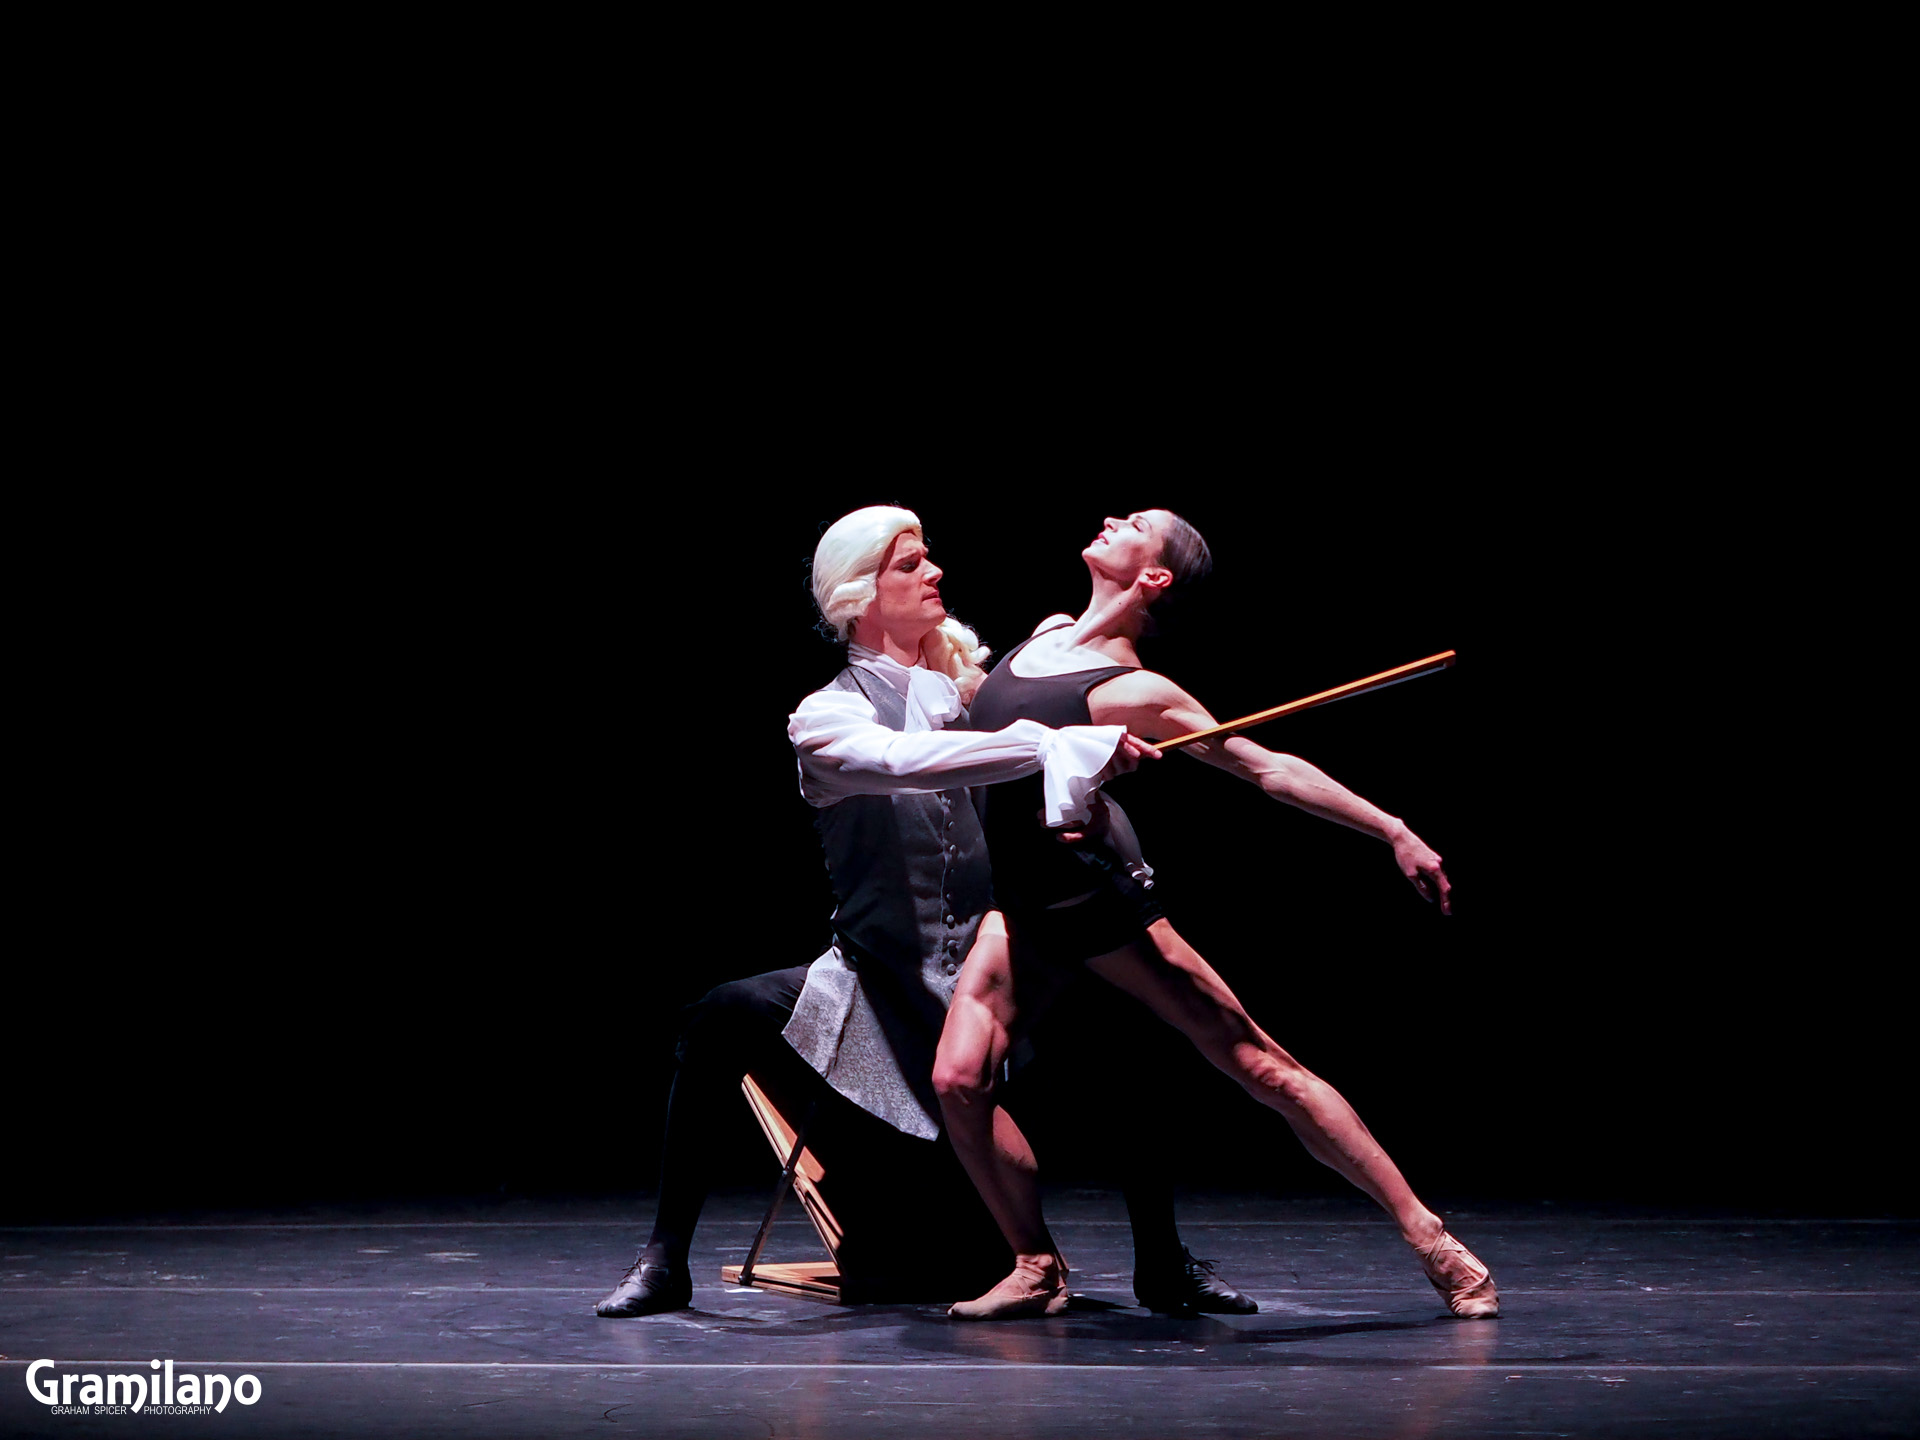 Polina Semionova and Dmitry Semionov in Nacho Duato's Cello